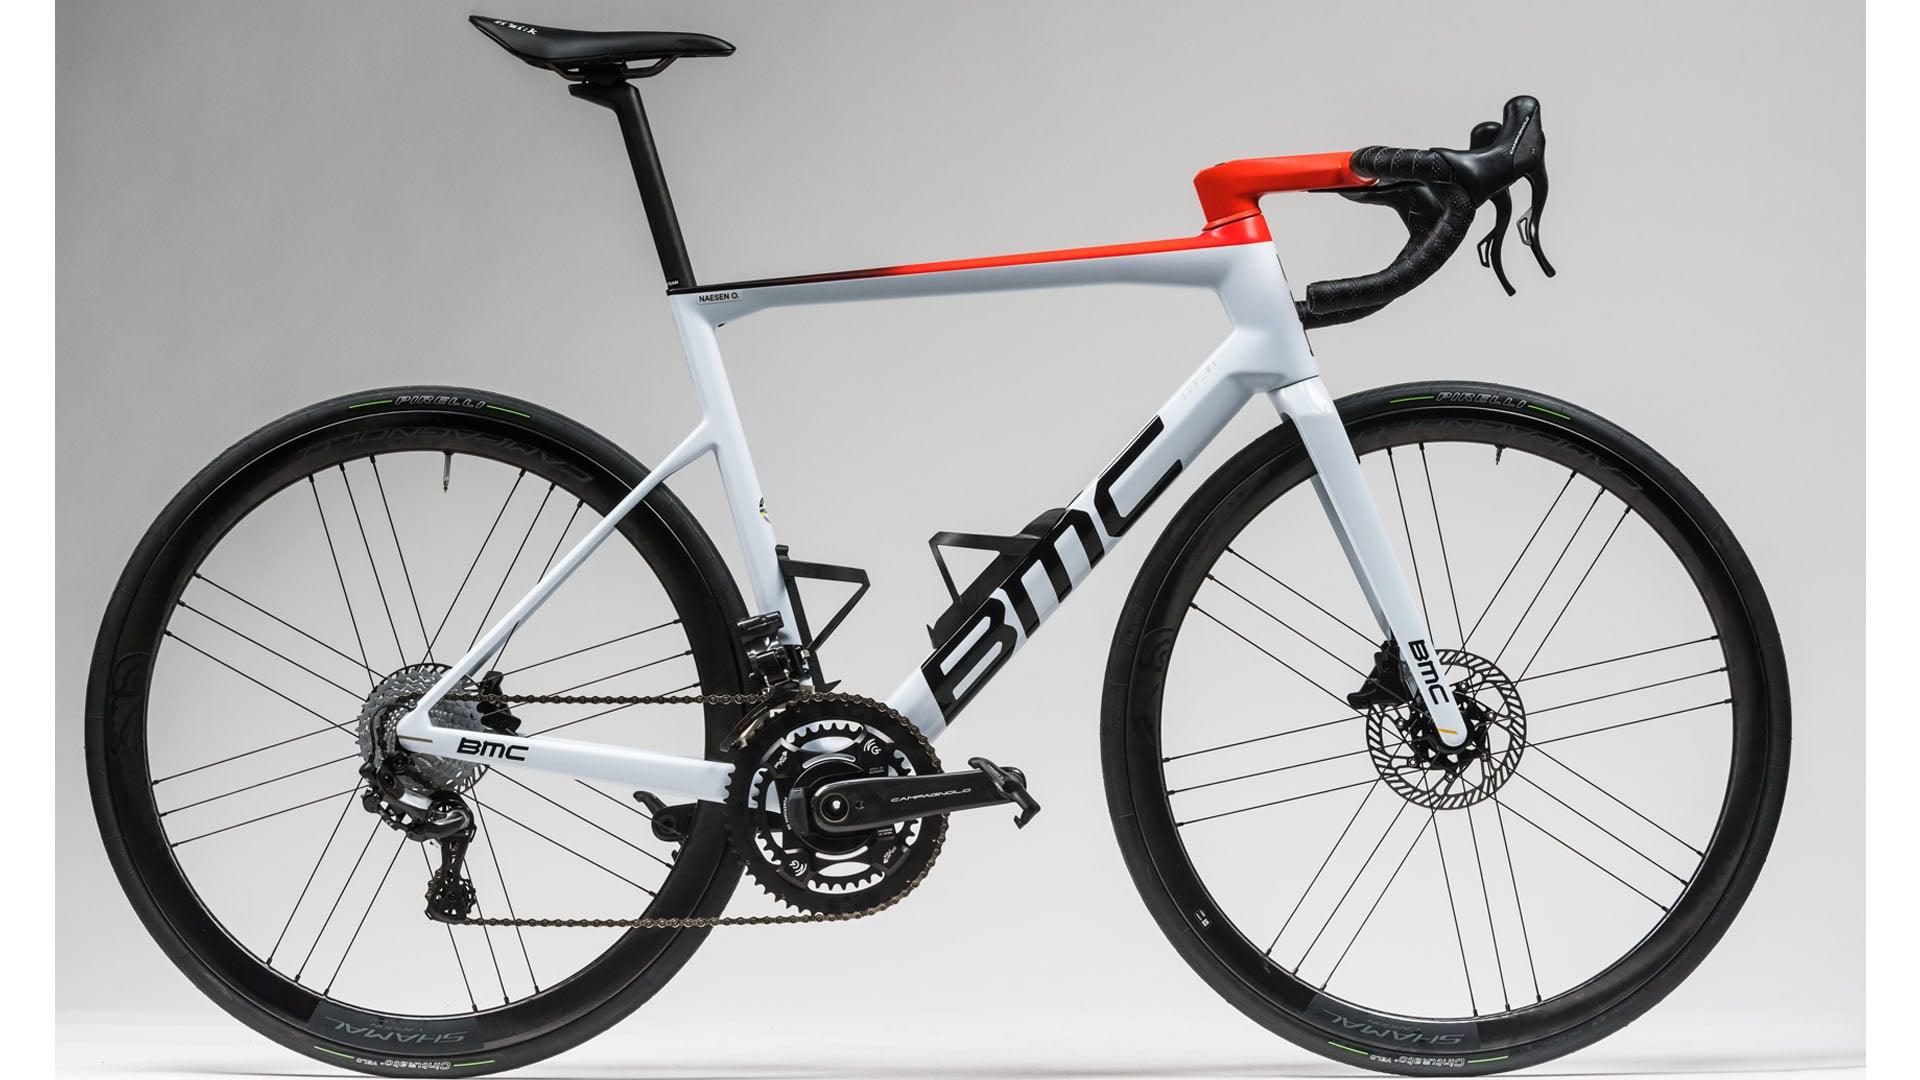 De BMC Teammachine SLR01 van Alexis Gougeard